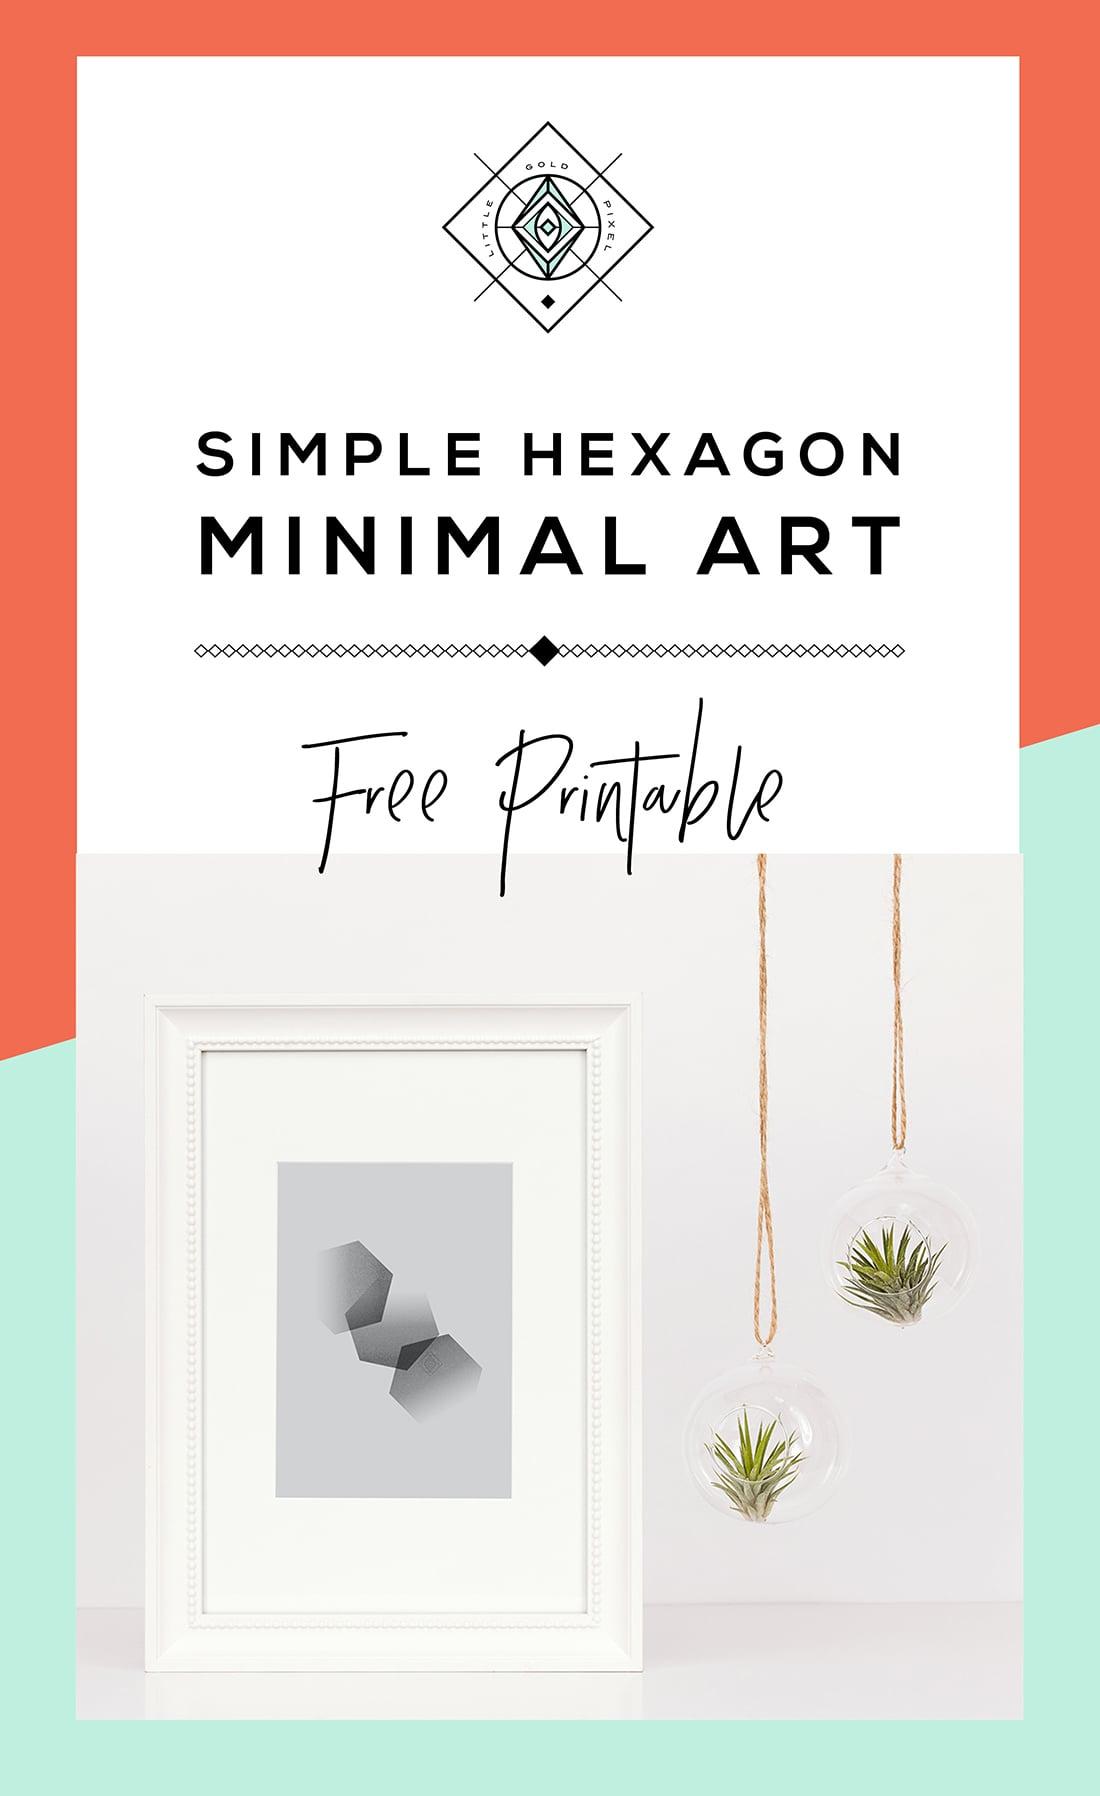 Free Minimal Hexagon Art Printable / Freebie Fridays